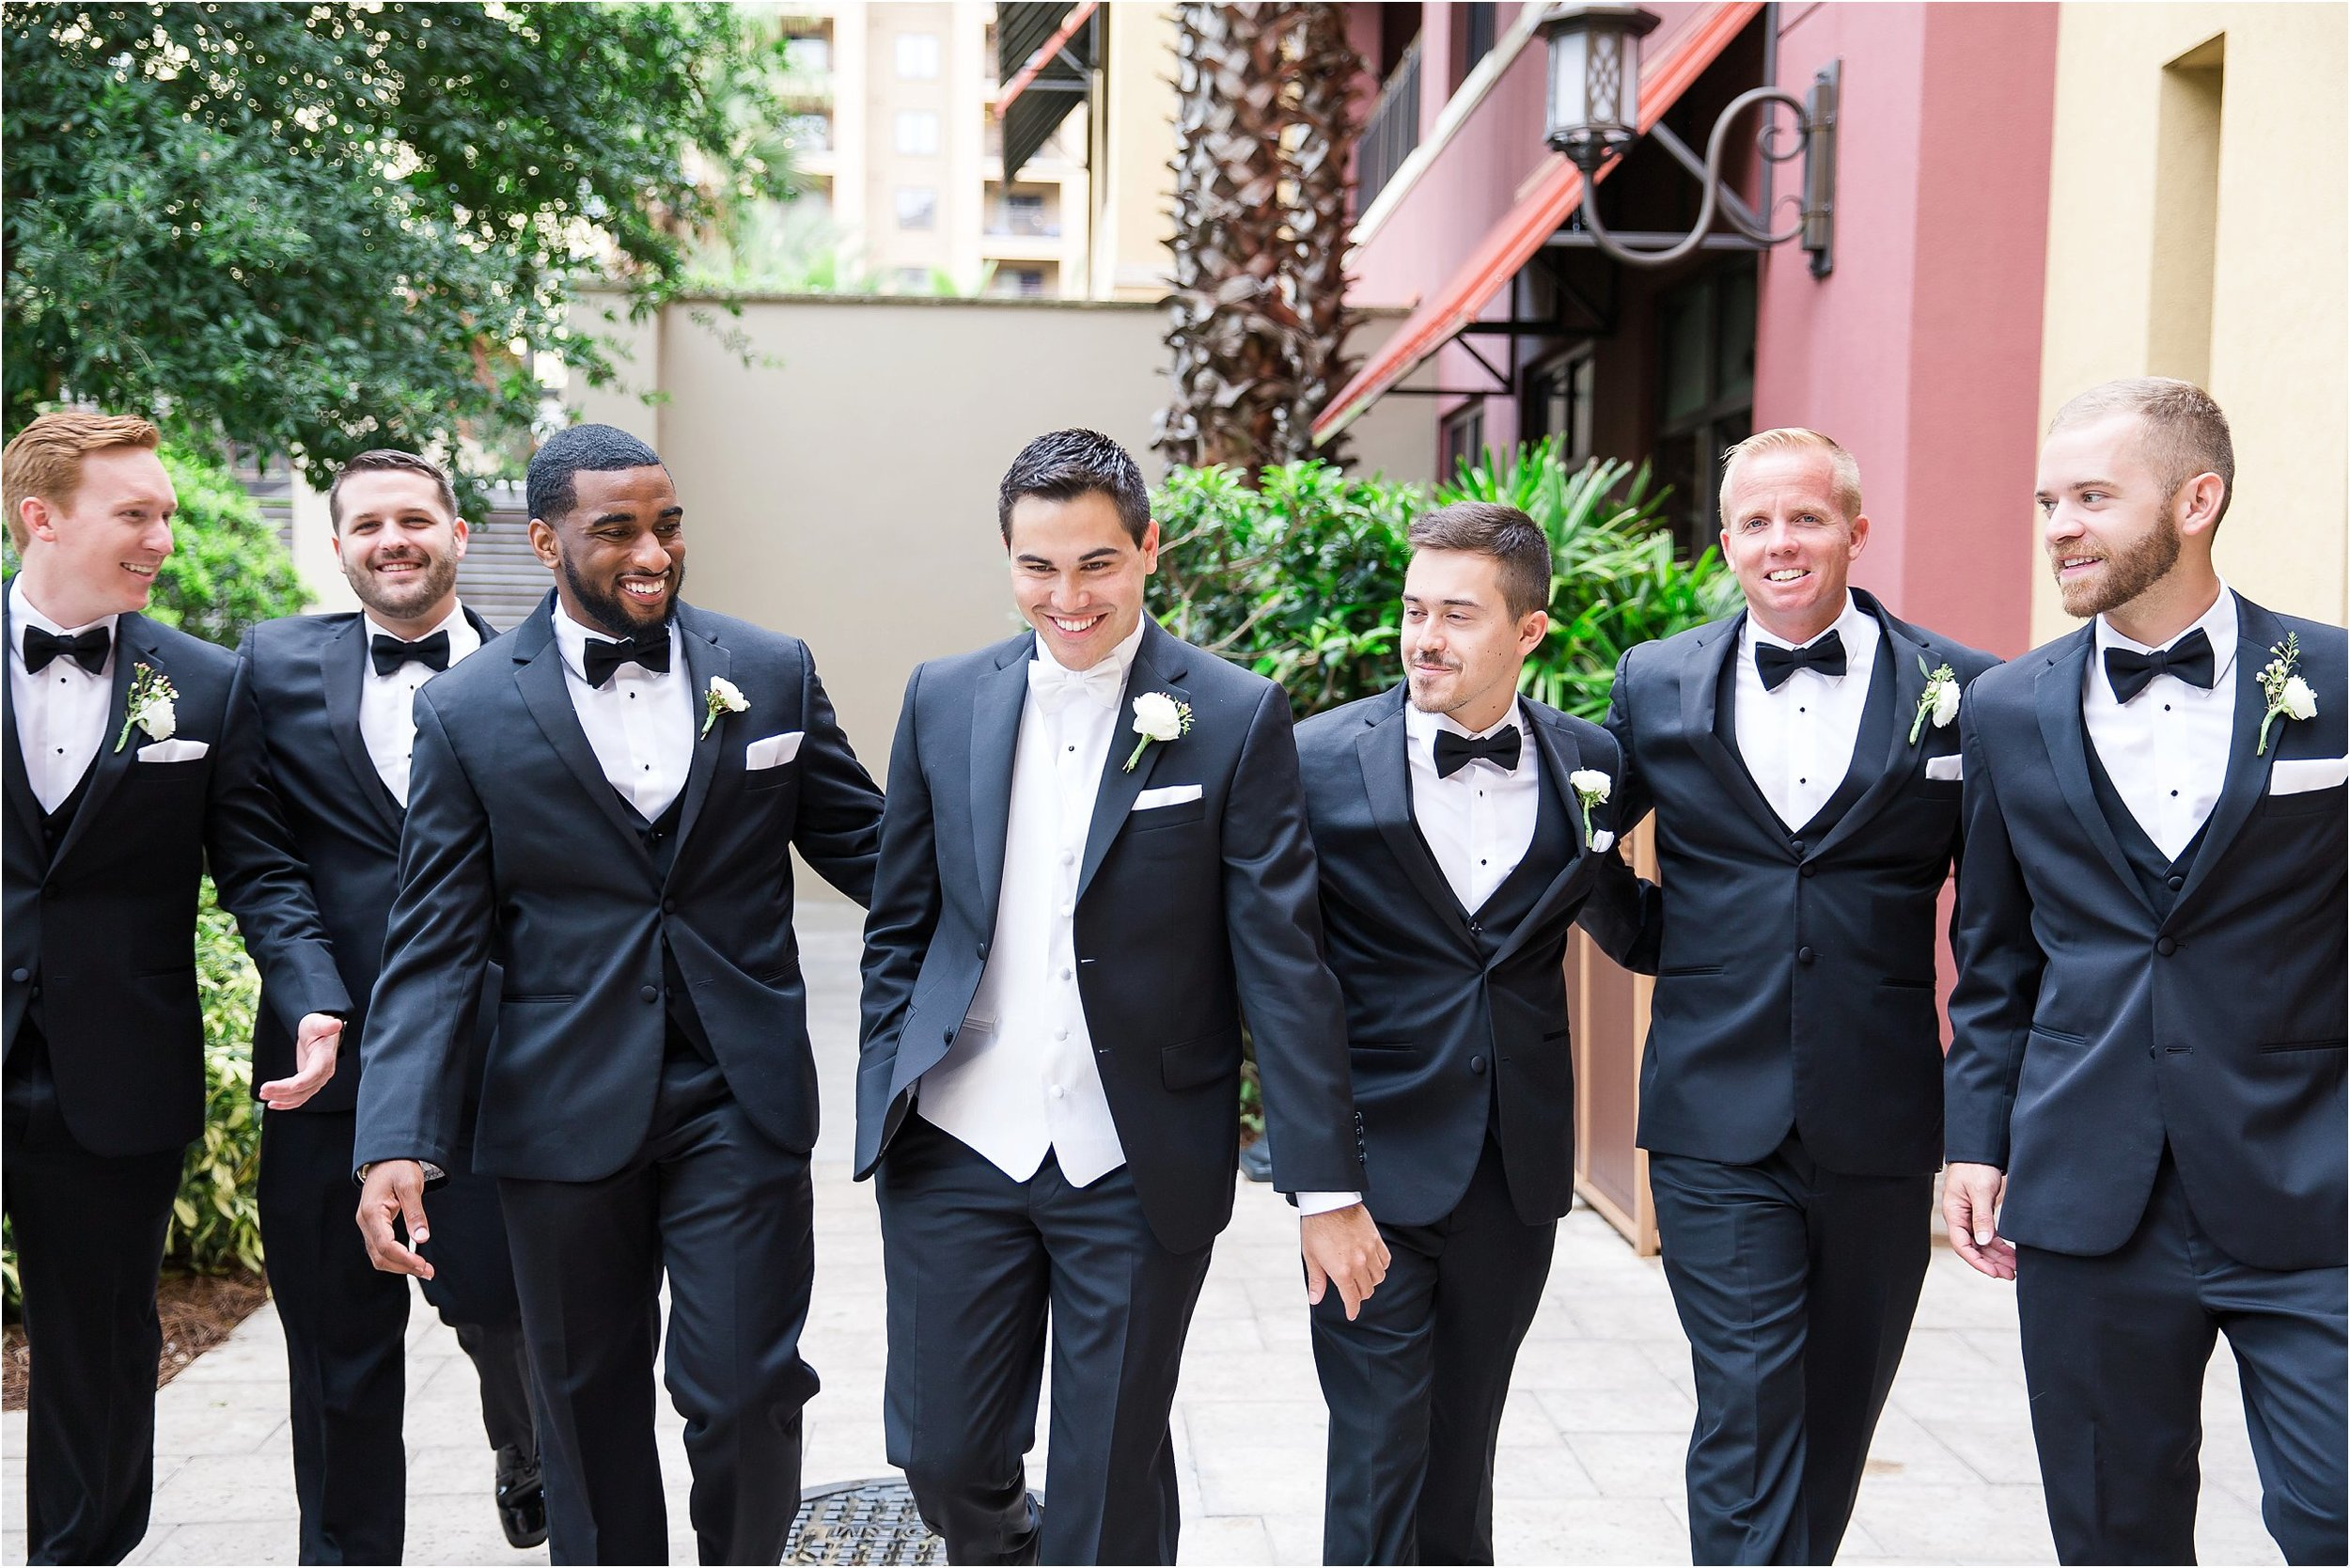 Groom portraits with ranunculus boutonniereat Wyndham Grand Resort at Bonnet Creek wedding by PSJ Photography